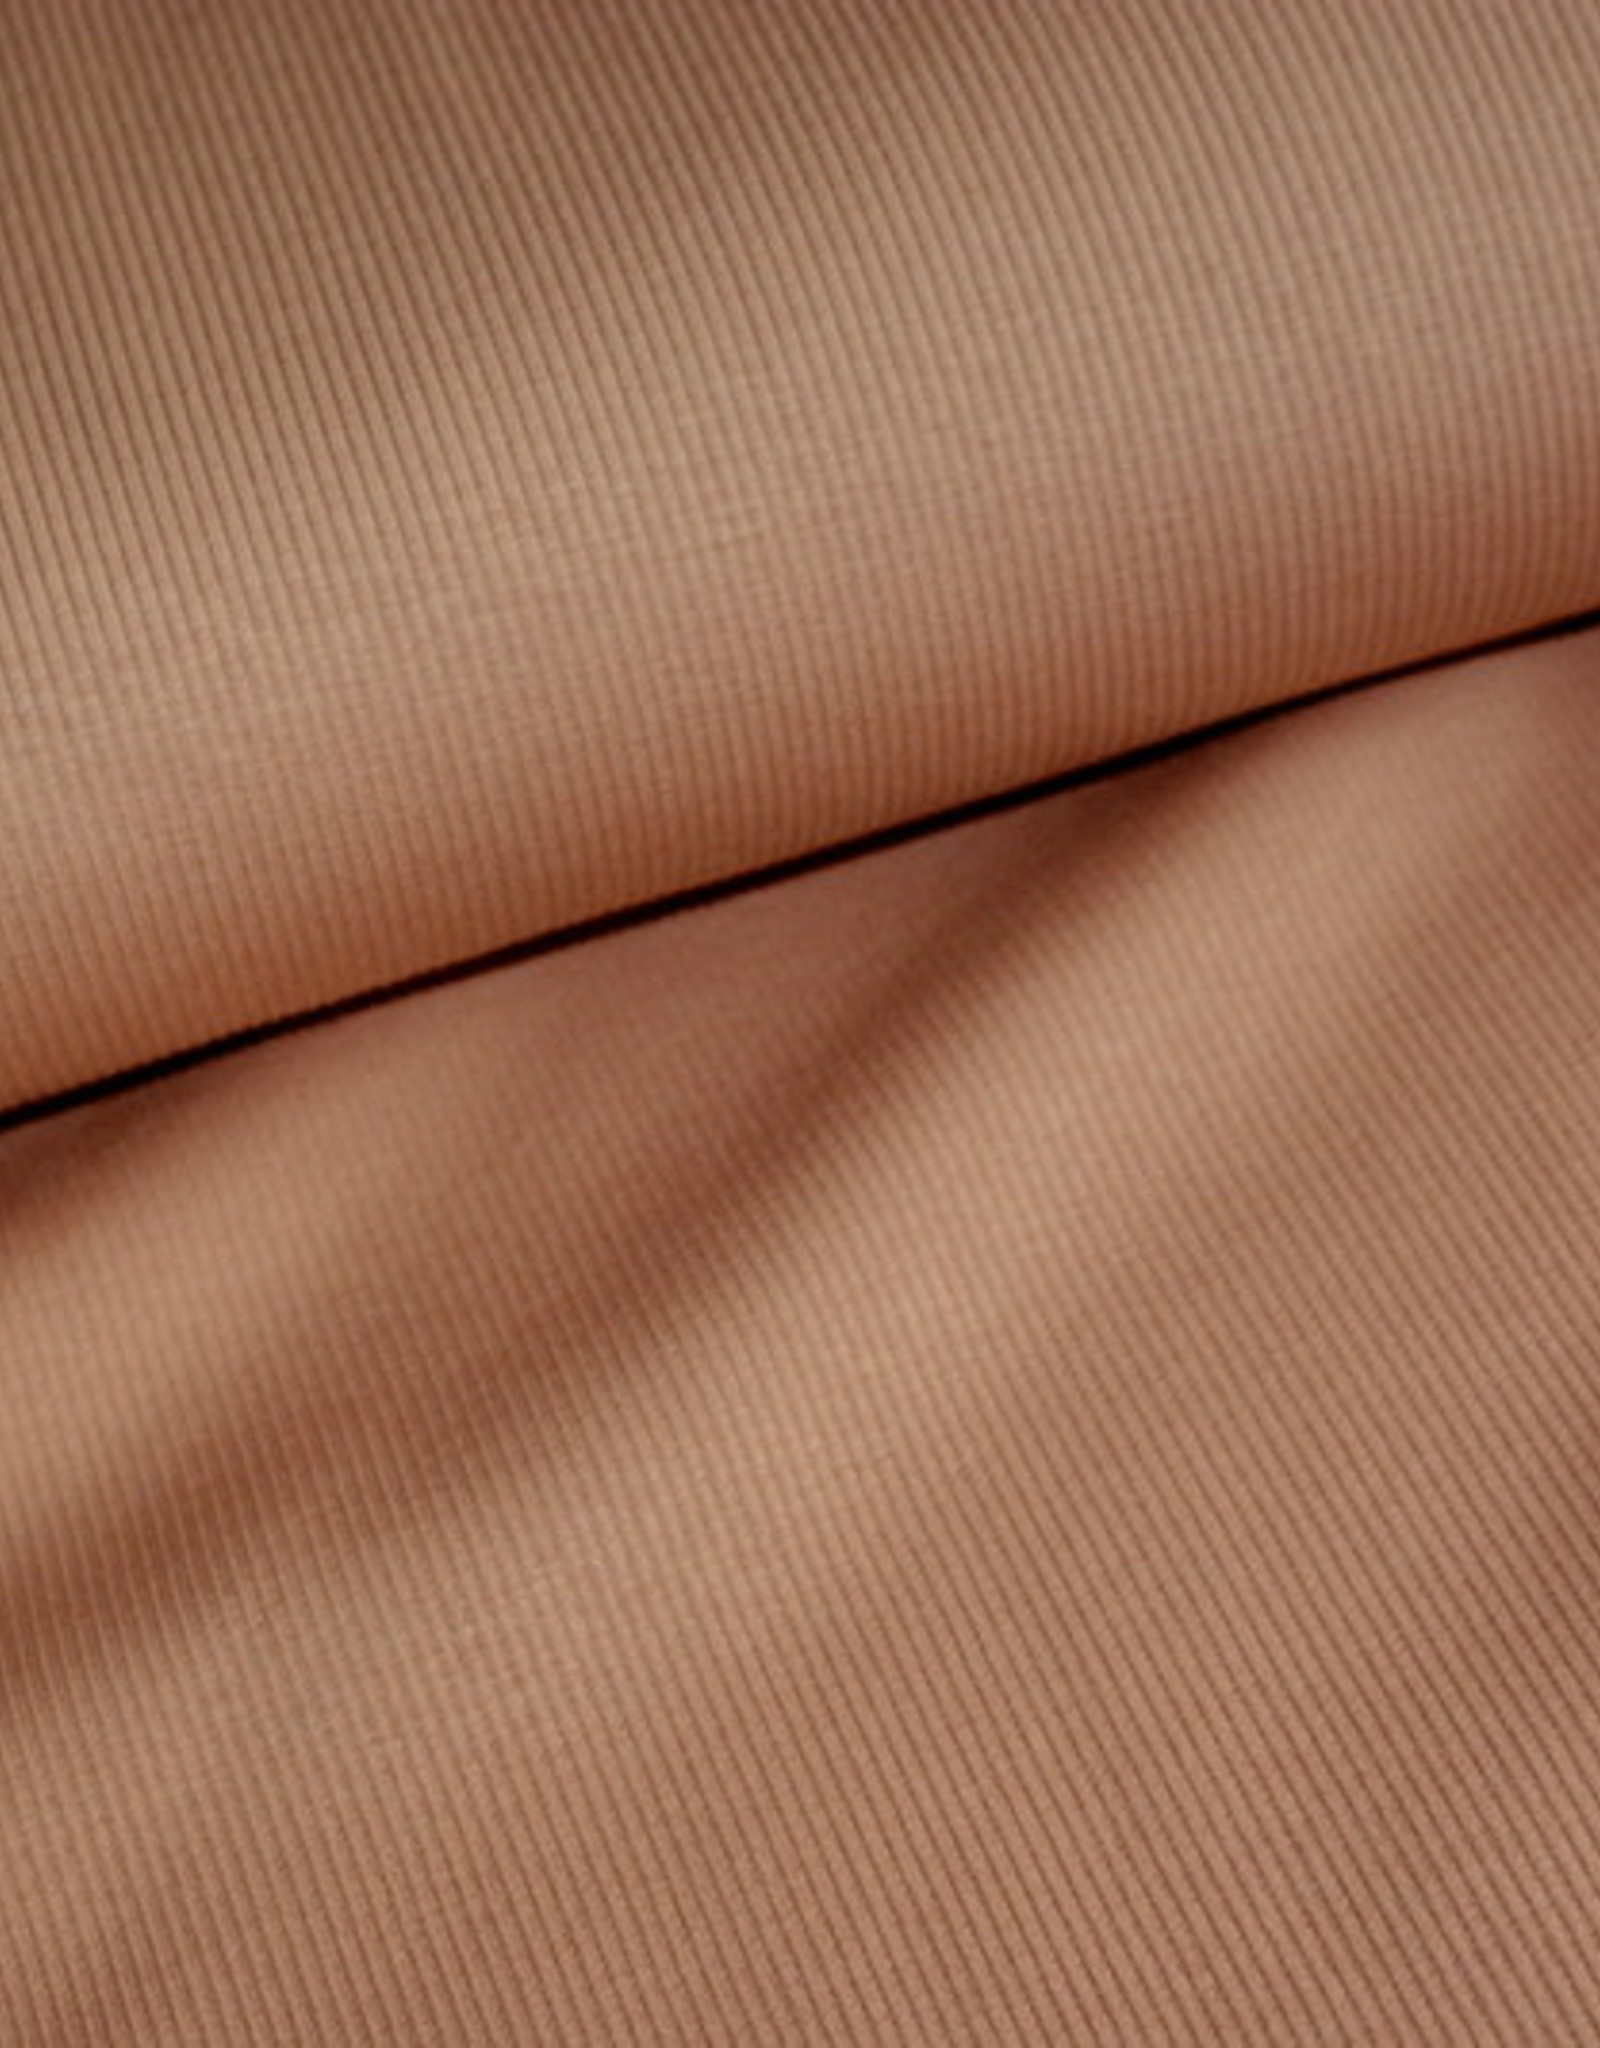 Family fabrics Sandstorm rib jersey